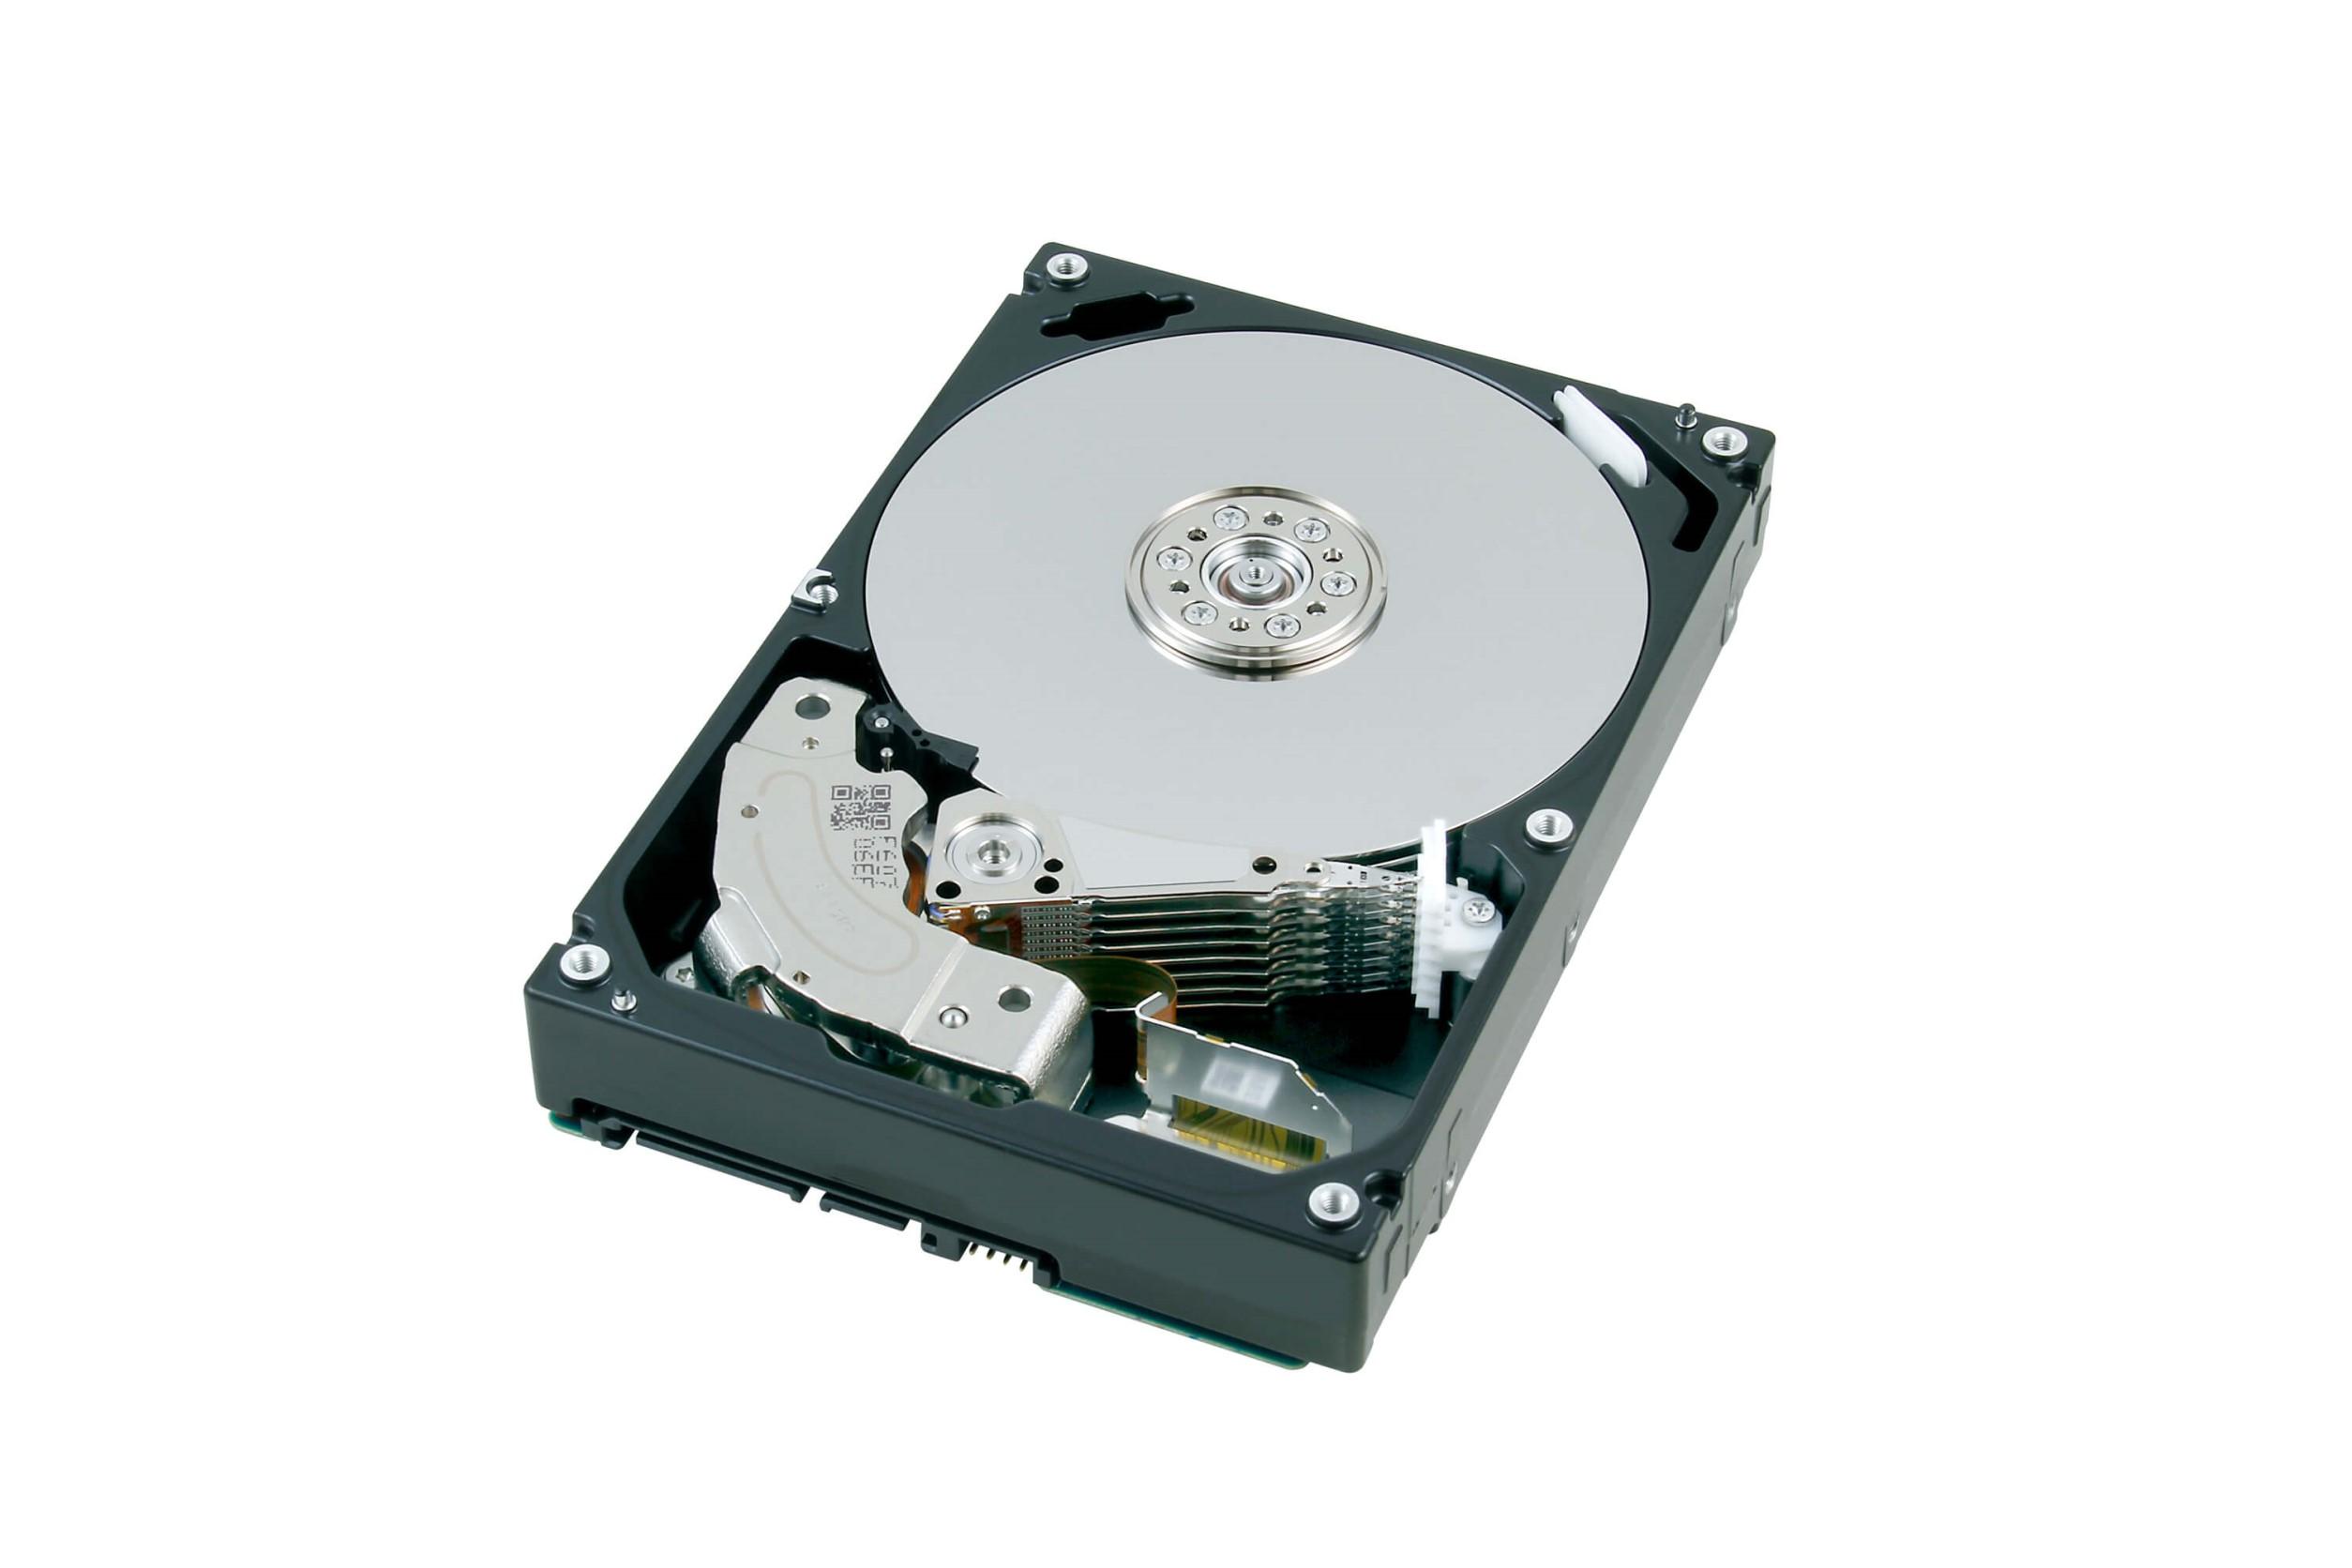 TOSHIBA宣布推出全新10TB監控專用硬碟!新款MD06ACA-V系列支援更高解析度影像串流 達到監視效能最佳化